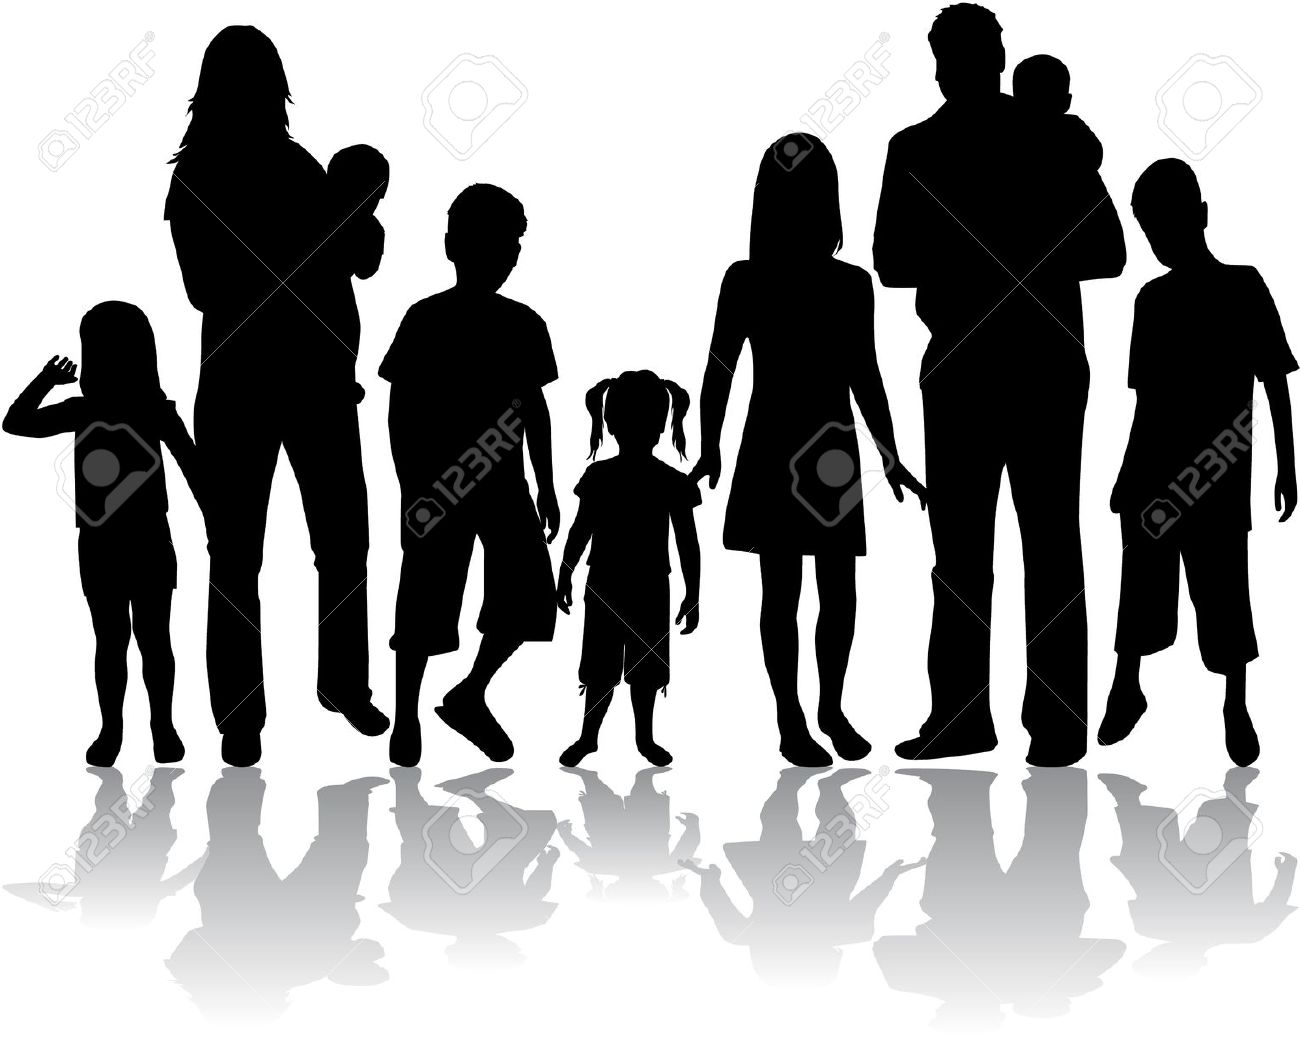 La famille la plus grande de Berlgique